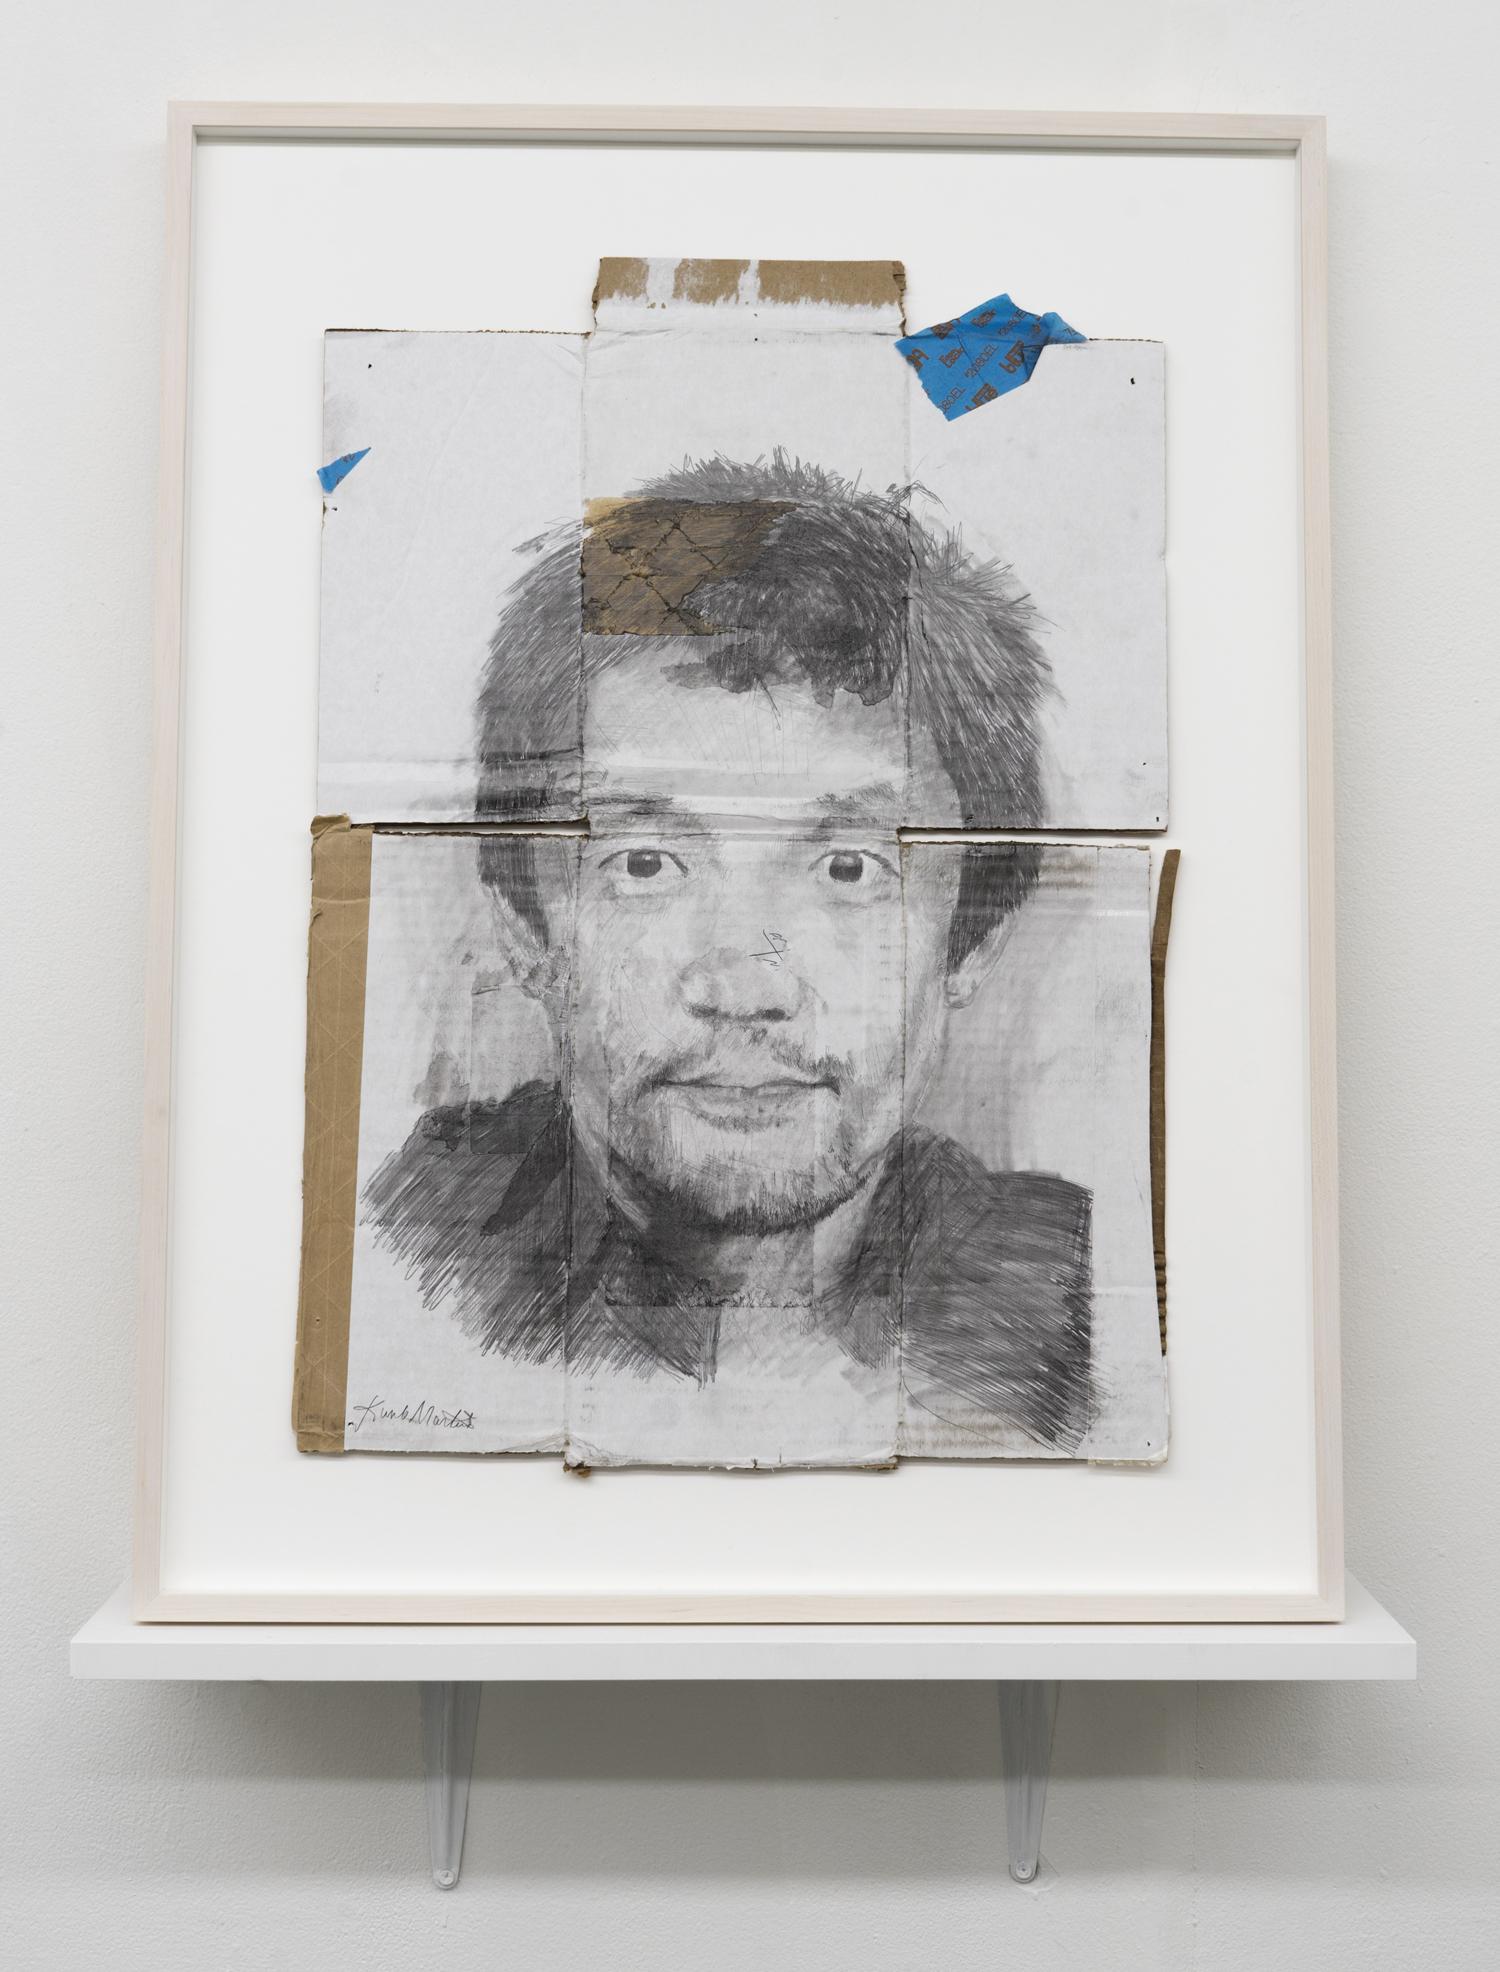 Kunle F. Martins,  Kenji, 2018,  pencil on found white cardboard box, 29 ½ × 23 inches